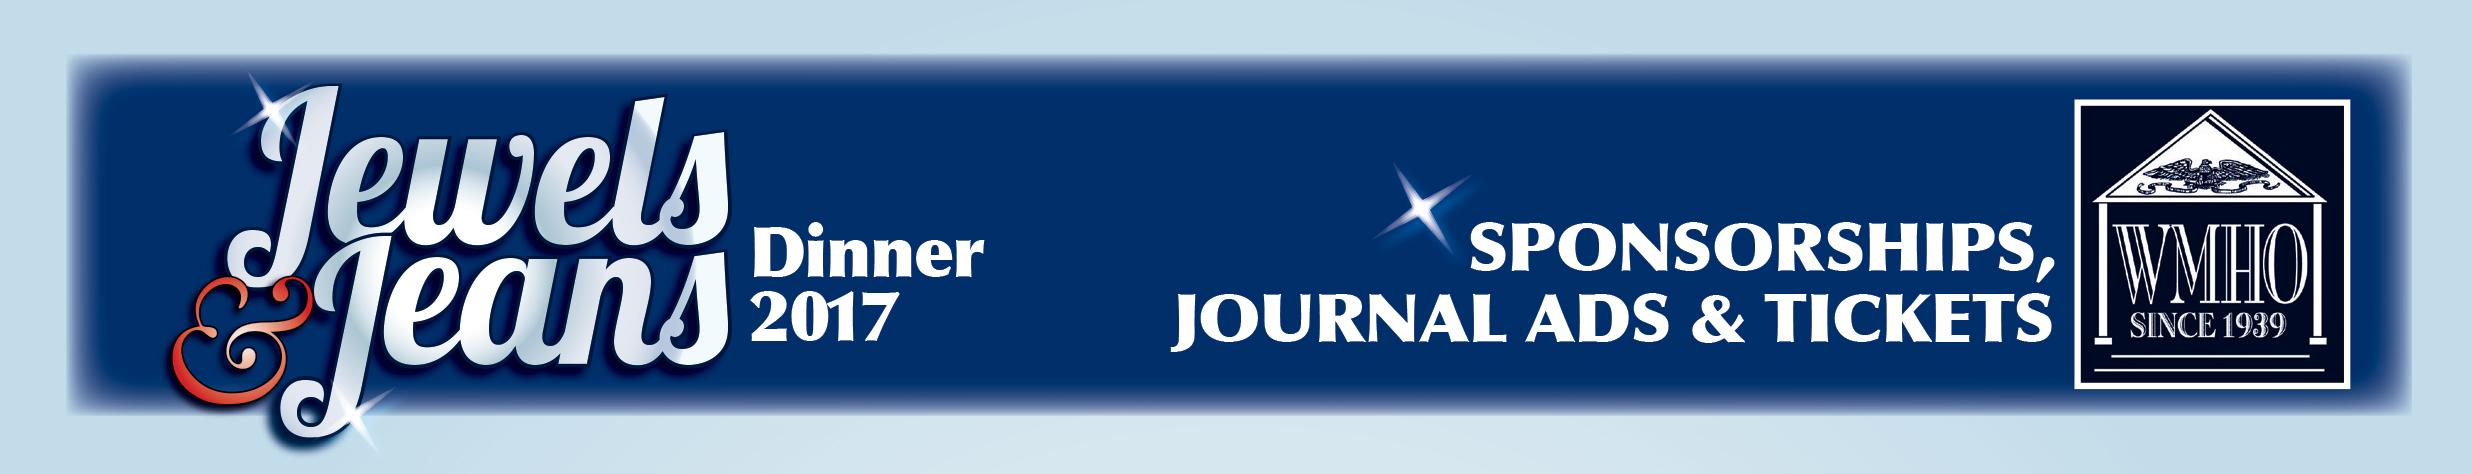 jewelsjeans-2017-header